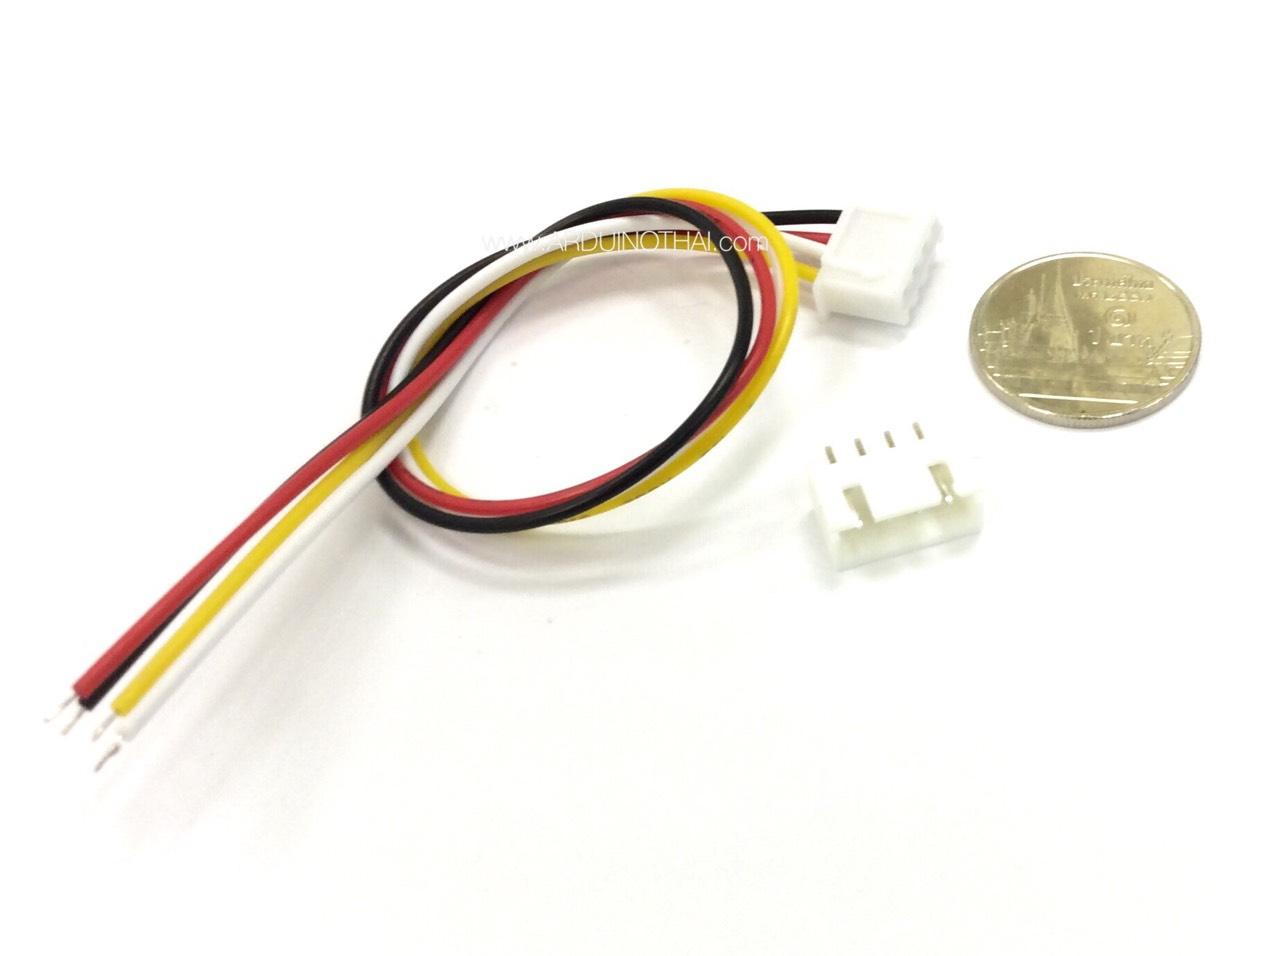 XH2.54-4P socket (สายไฟยาว 20 CM)